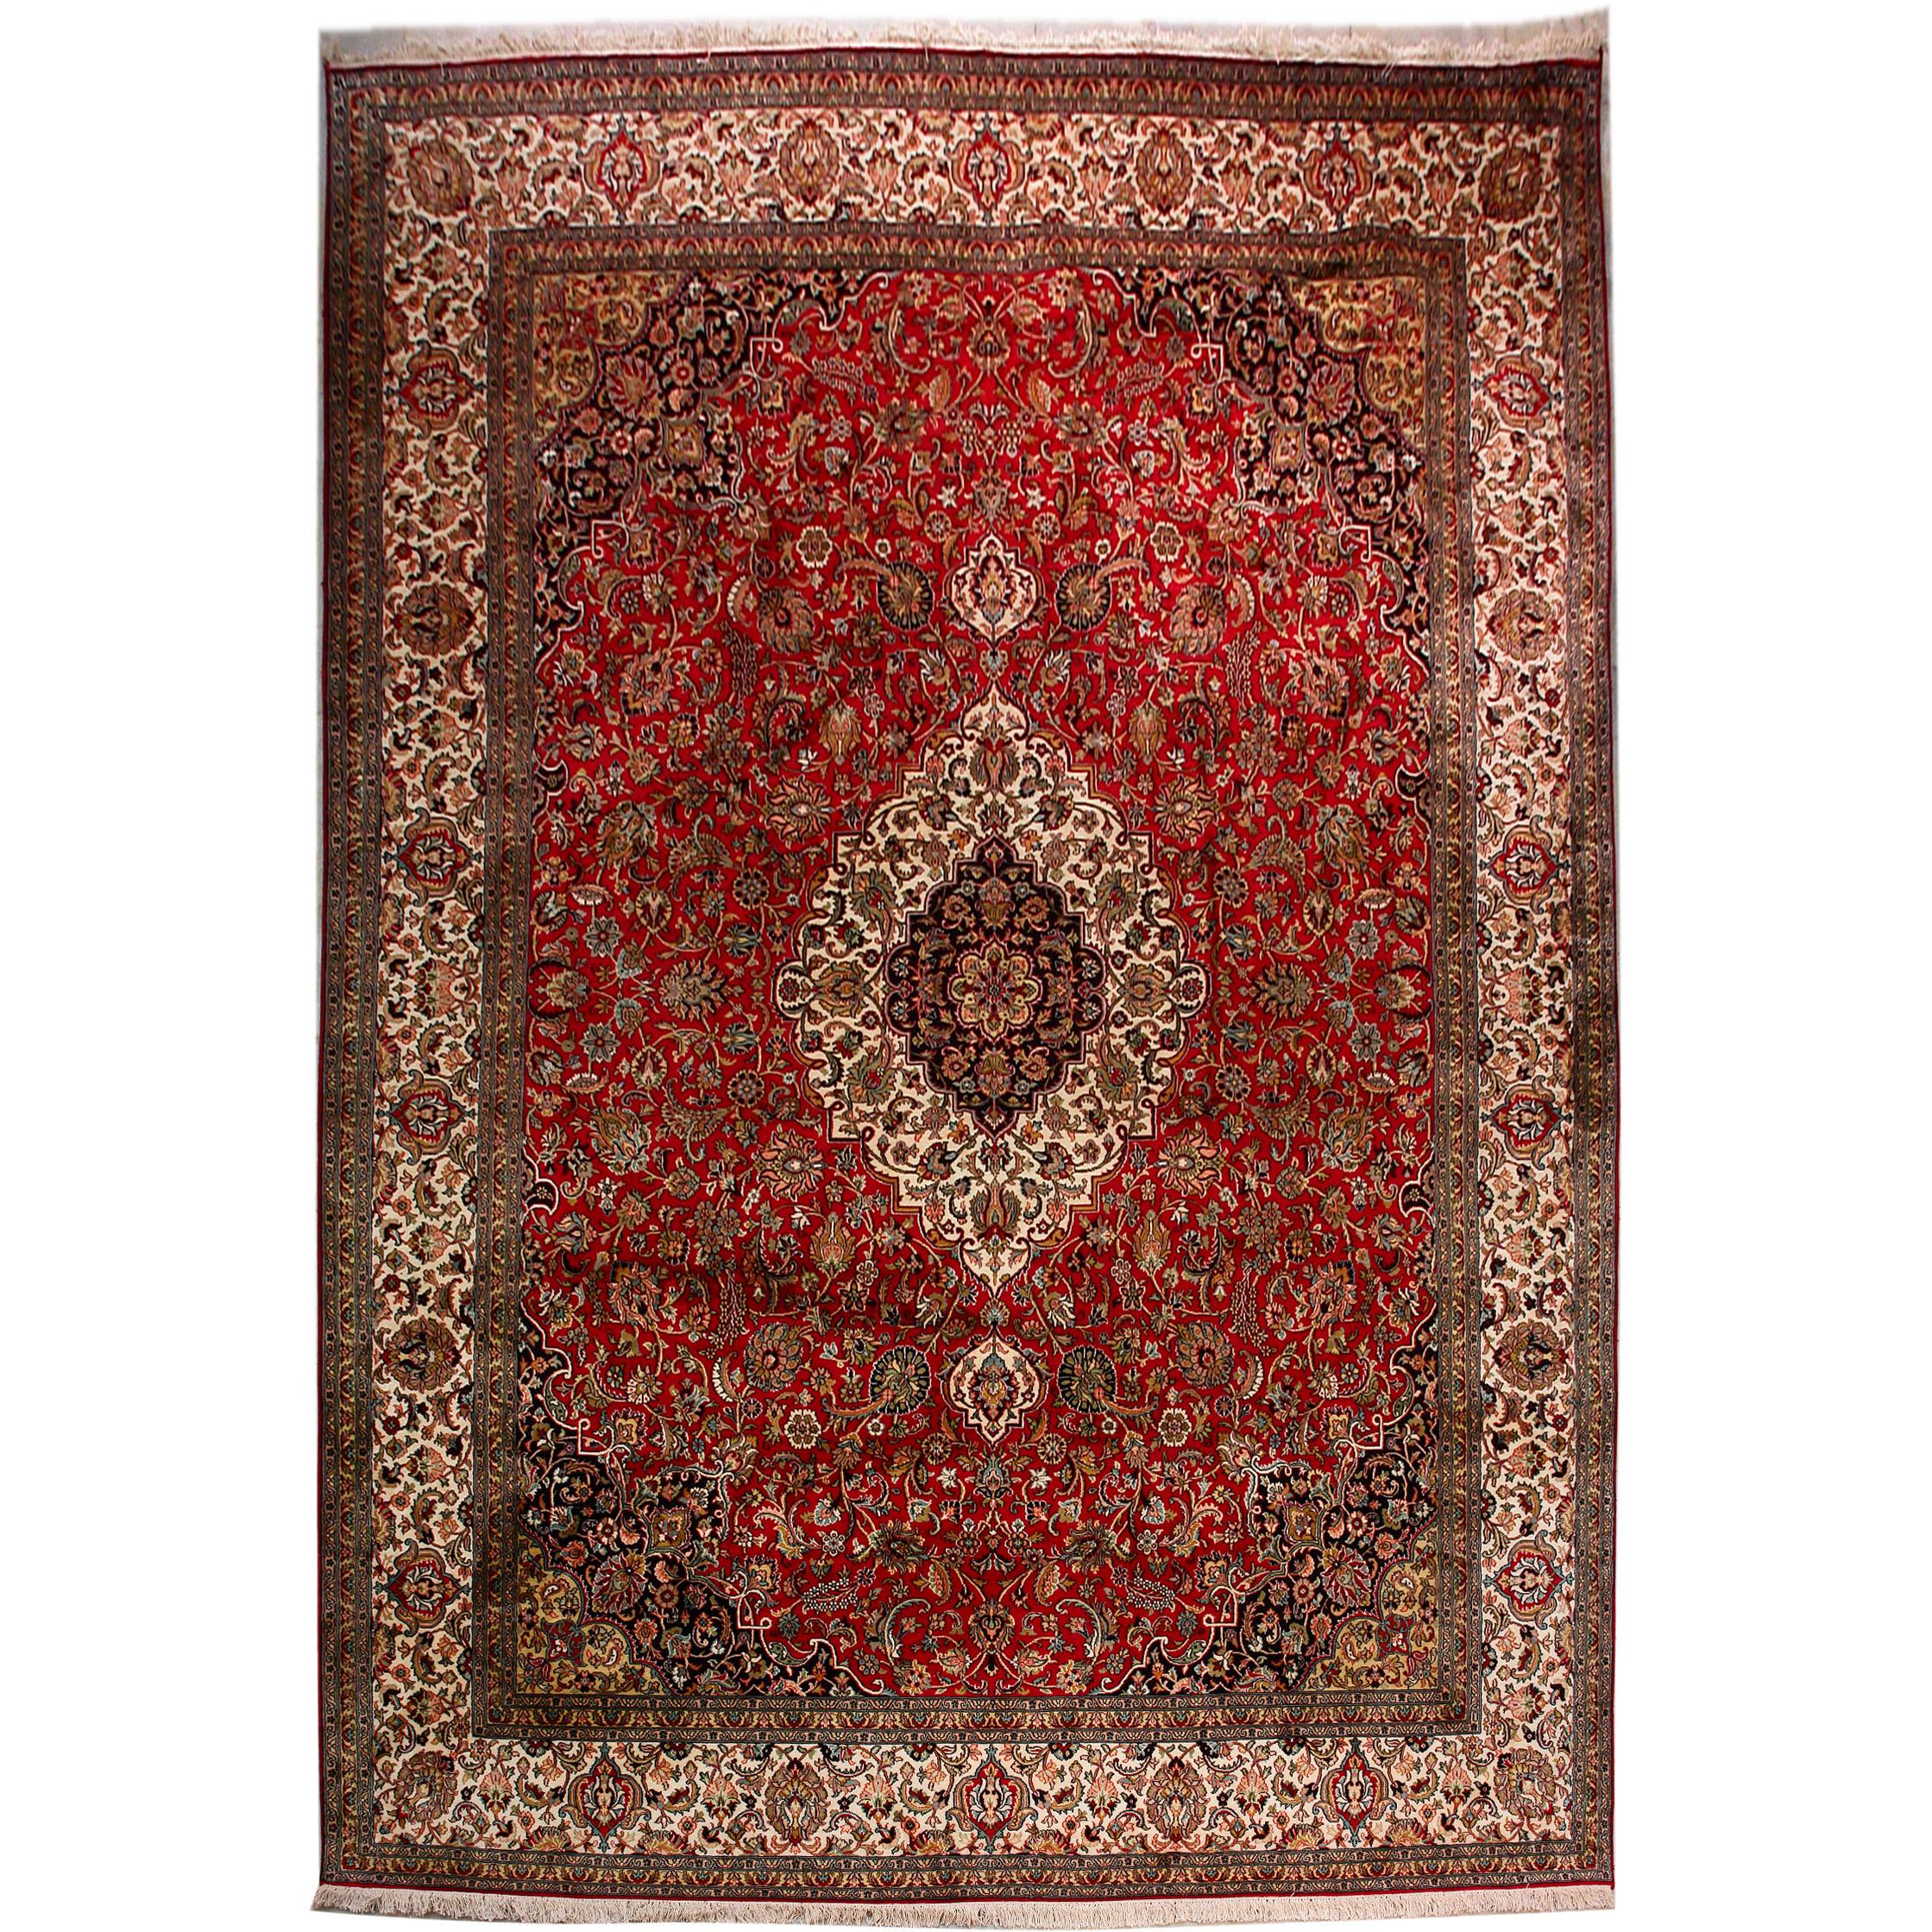 Classic Rugs :: Kashmir silk Exclusive 345x248cm Oriental Silk Rug -  Περσικα Ανατολιτικα χειροποίητα χαλιά Persian Art Γλυφάδα